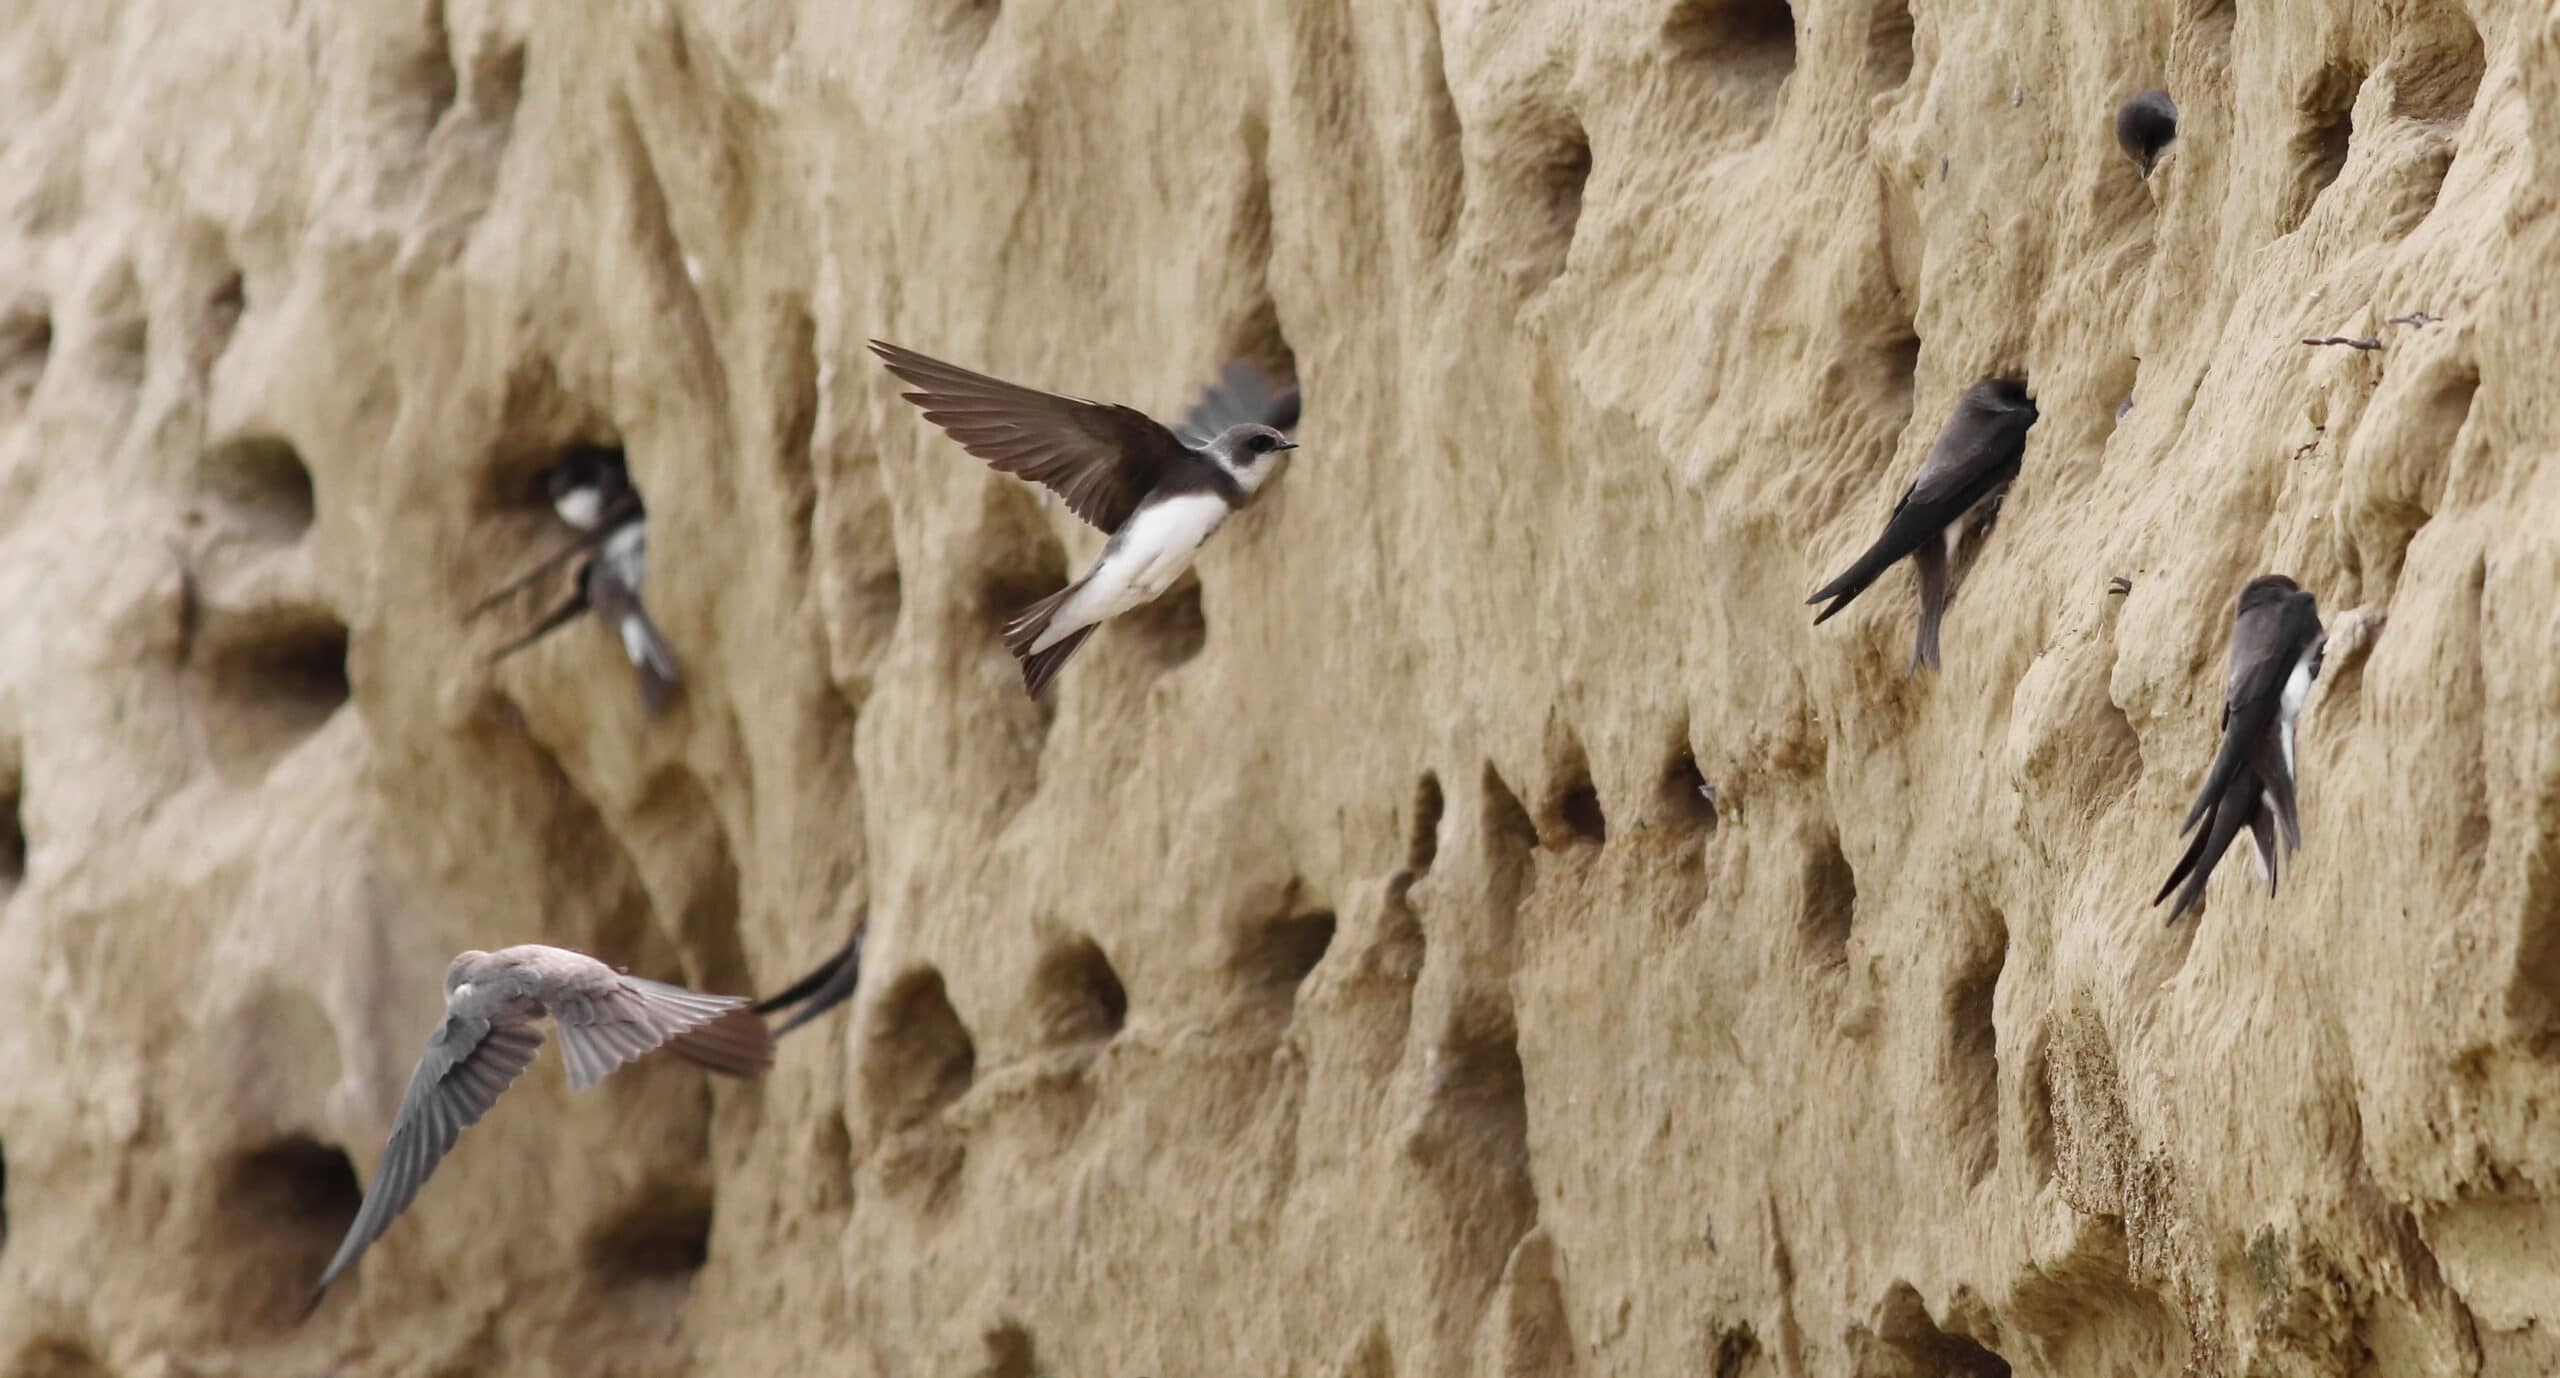 Colony,Of,Swallows,,Sand,Martin,Breeding,,Riparia,Riparia